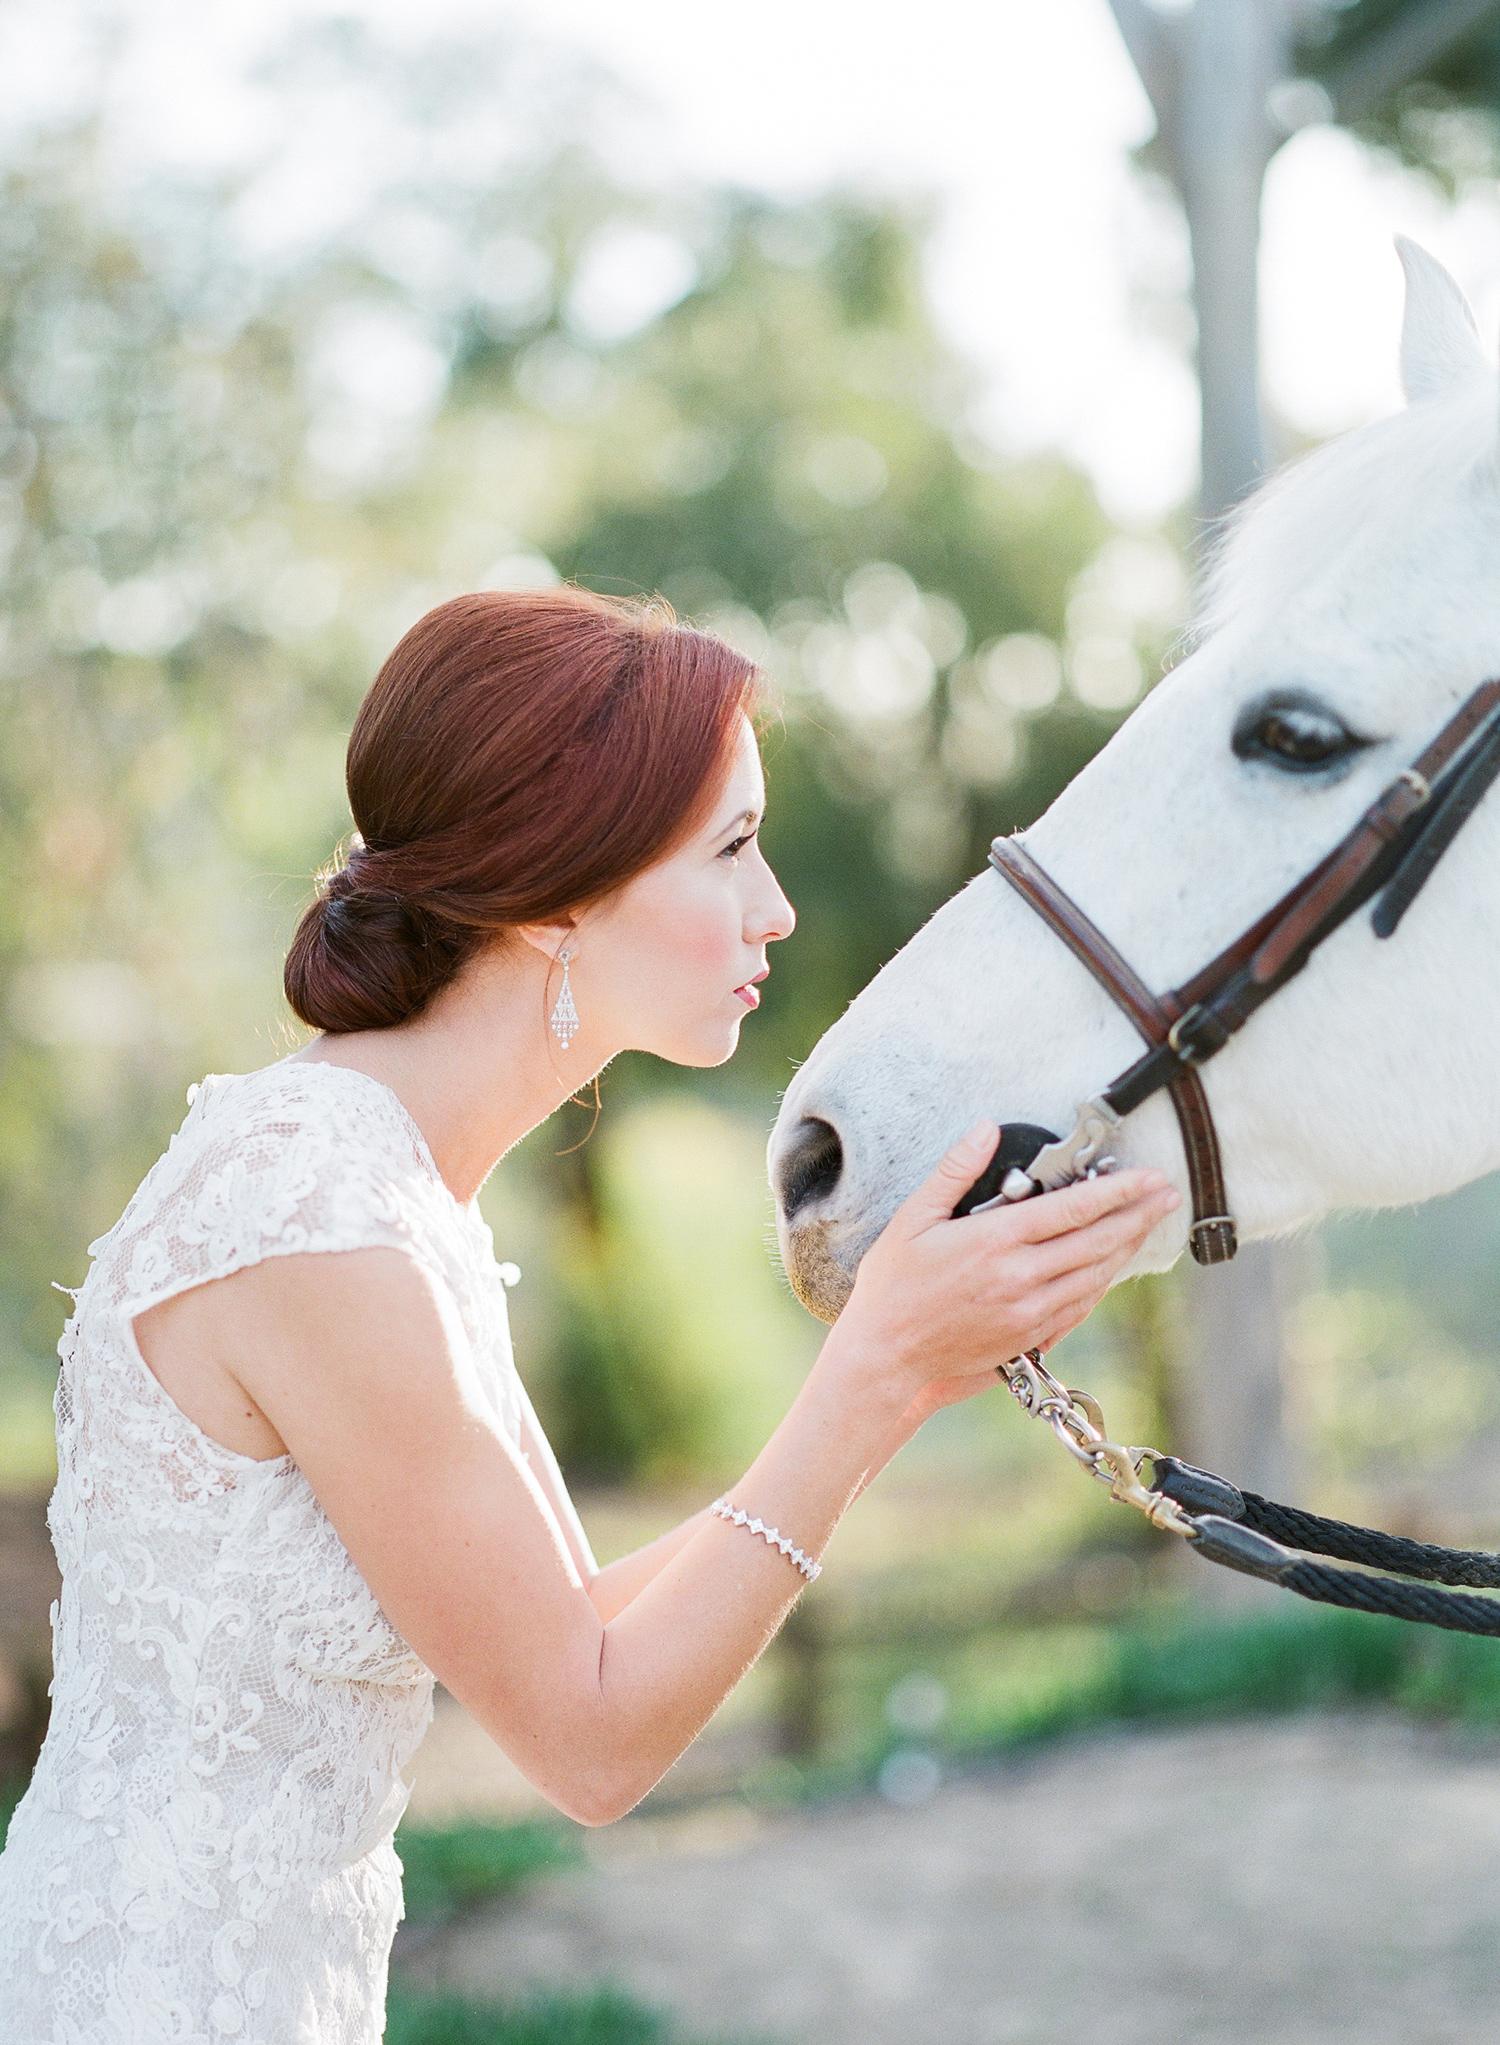 022-Jen-Wojcik-Photography-San-Diego-Wedding-Photographer.jpg